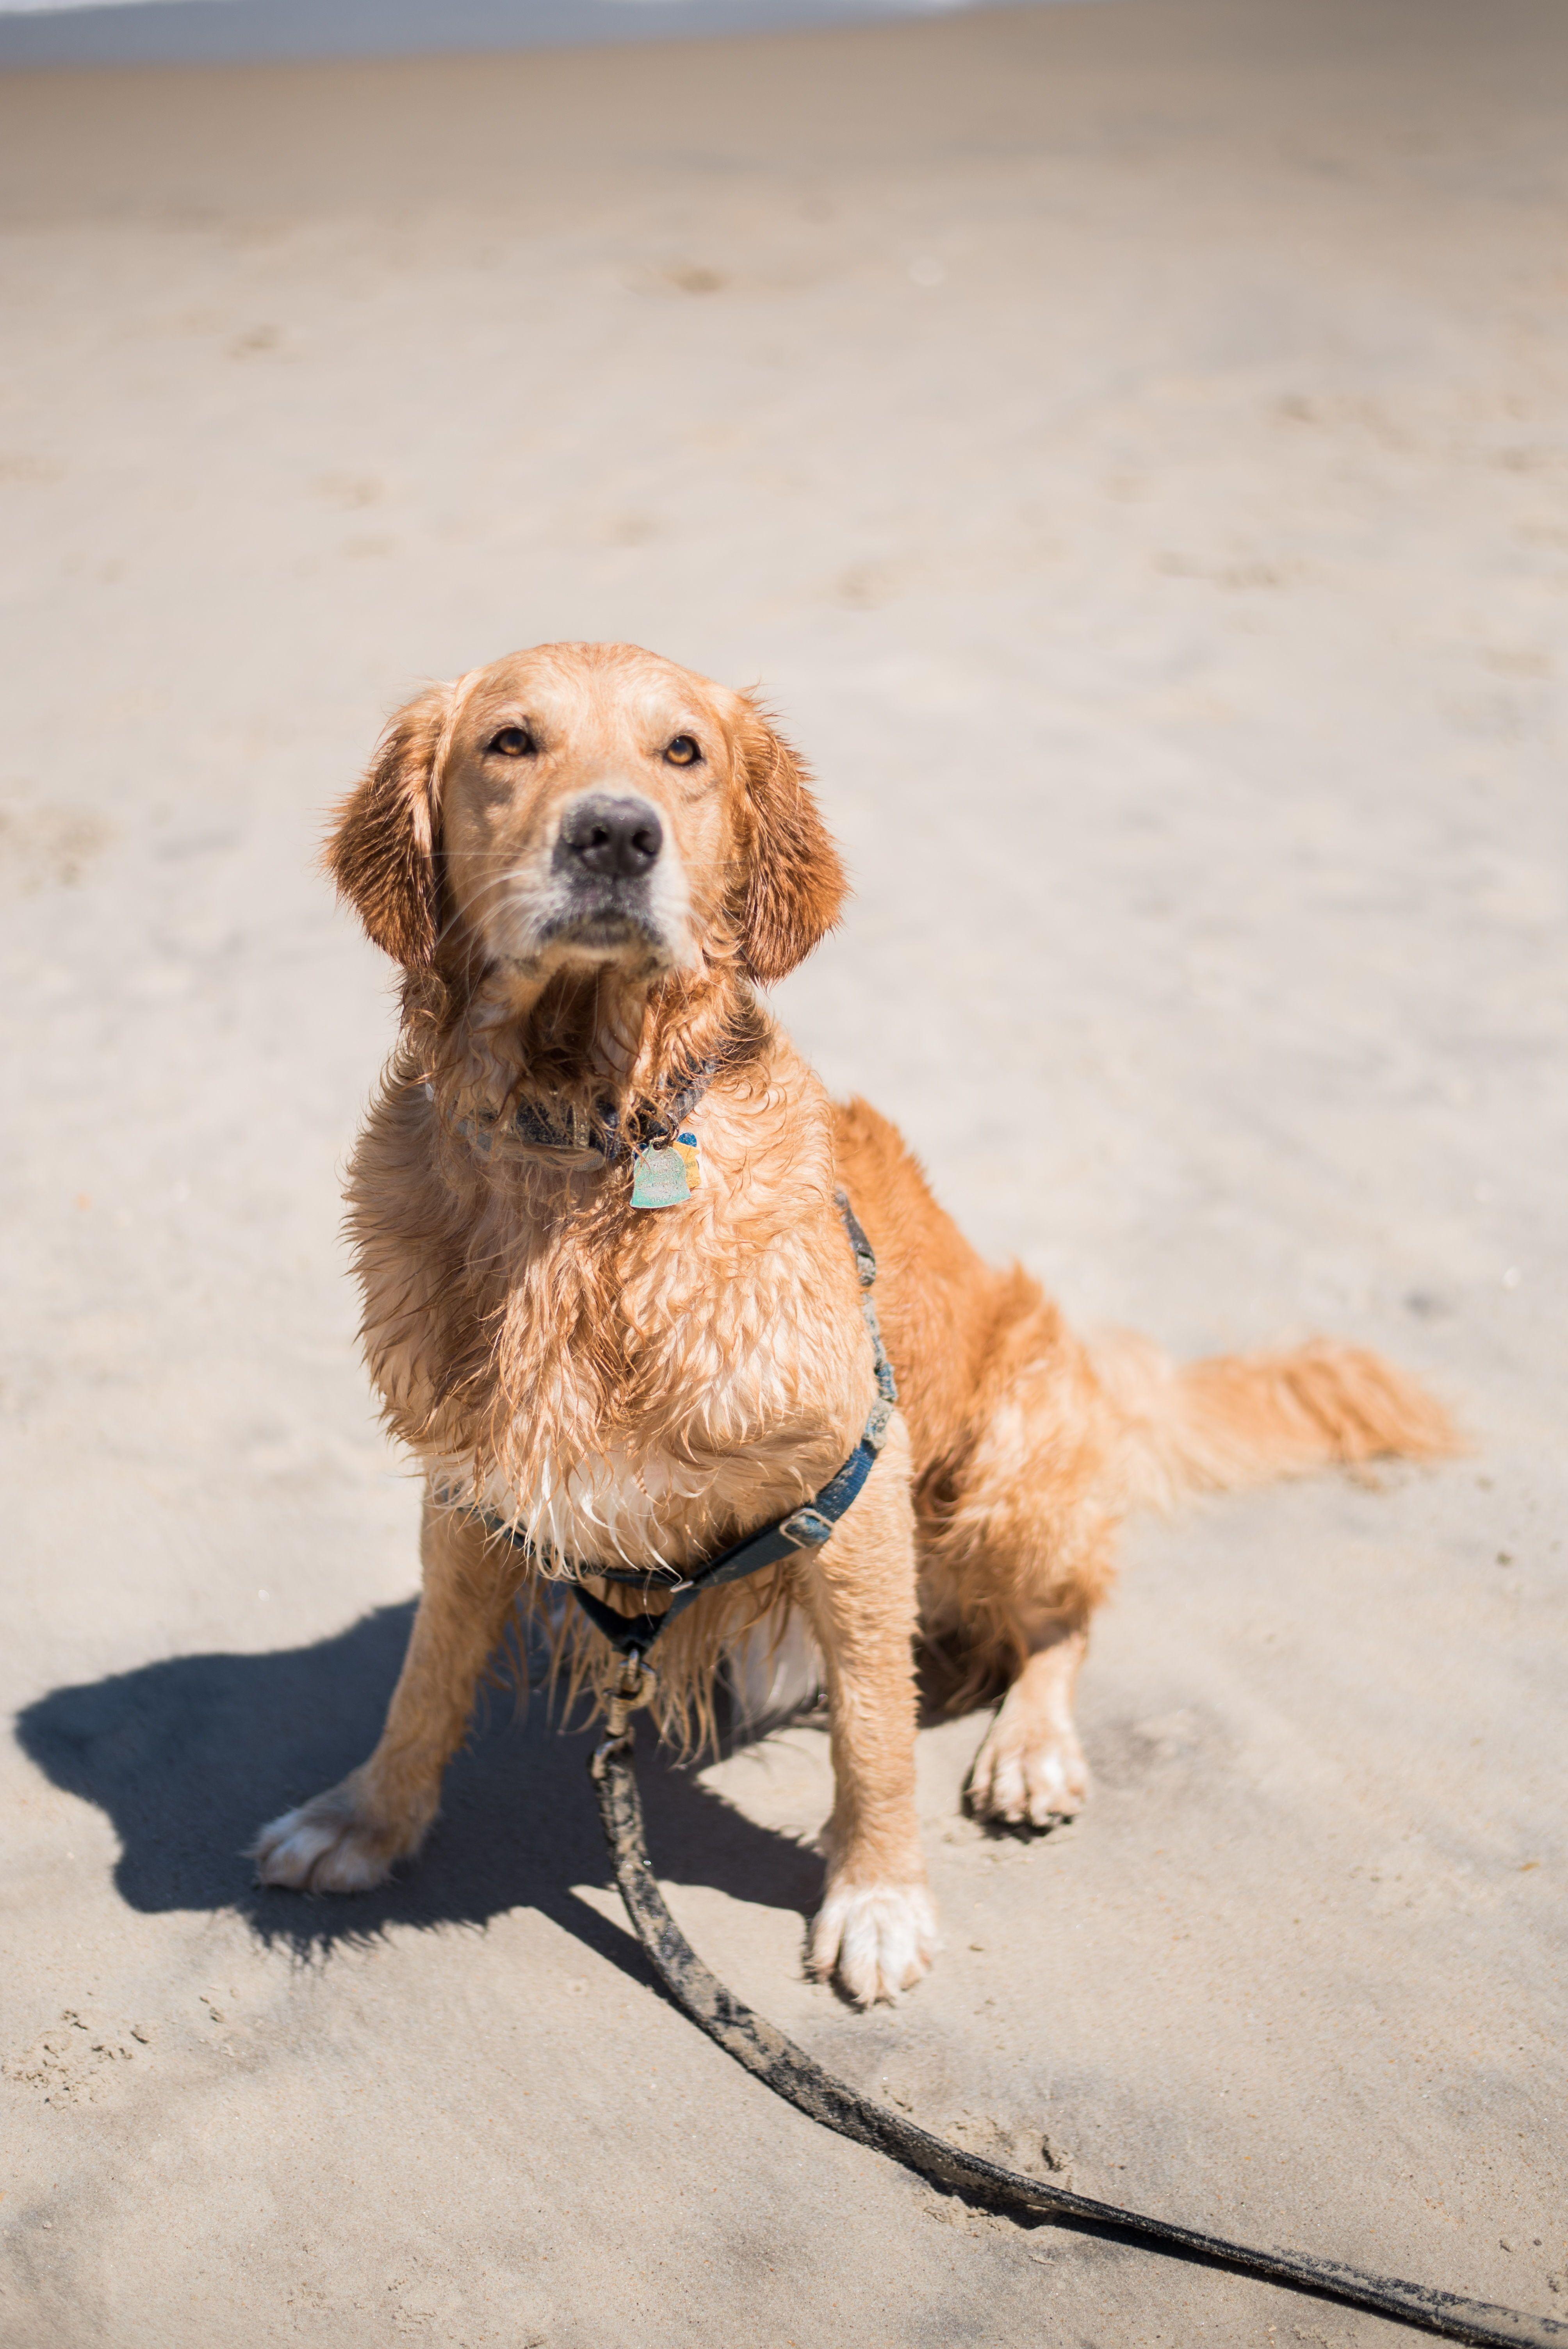 Explore How To Train A Golden Retriever Puppy In 2020 Golden Retriever Retriever Puppy Golden Retriever Puppy